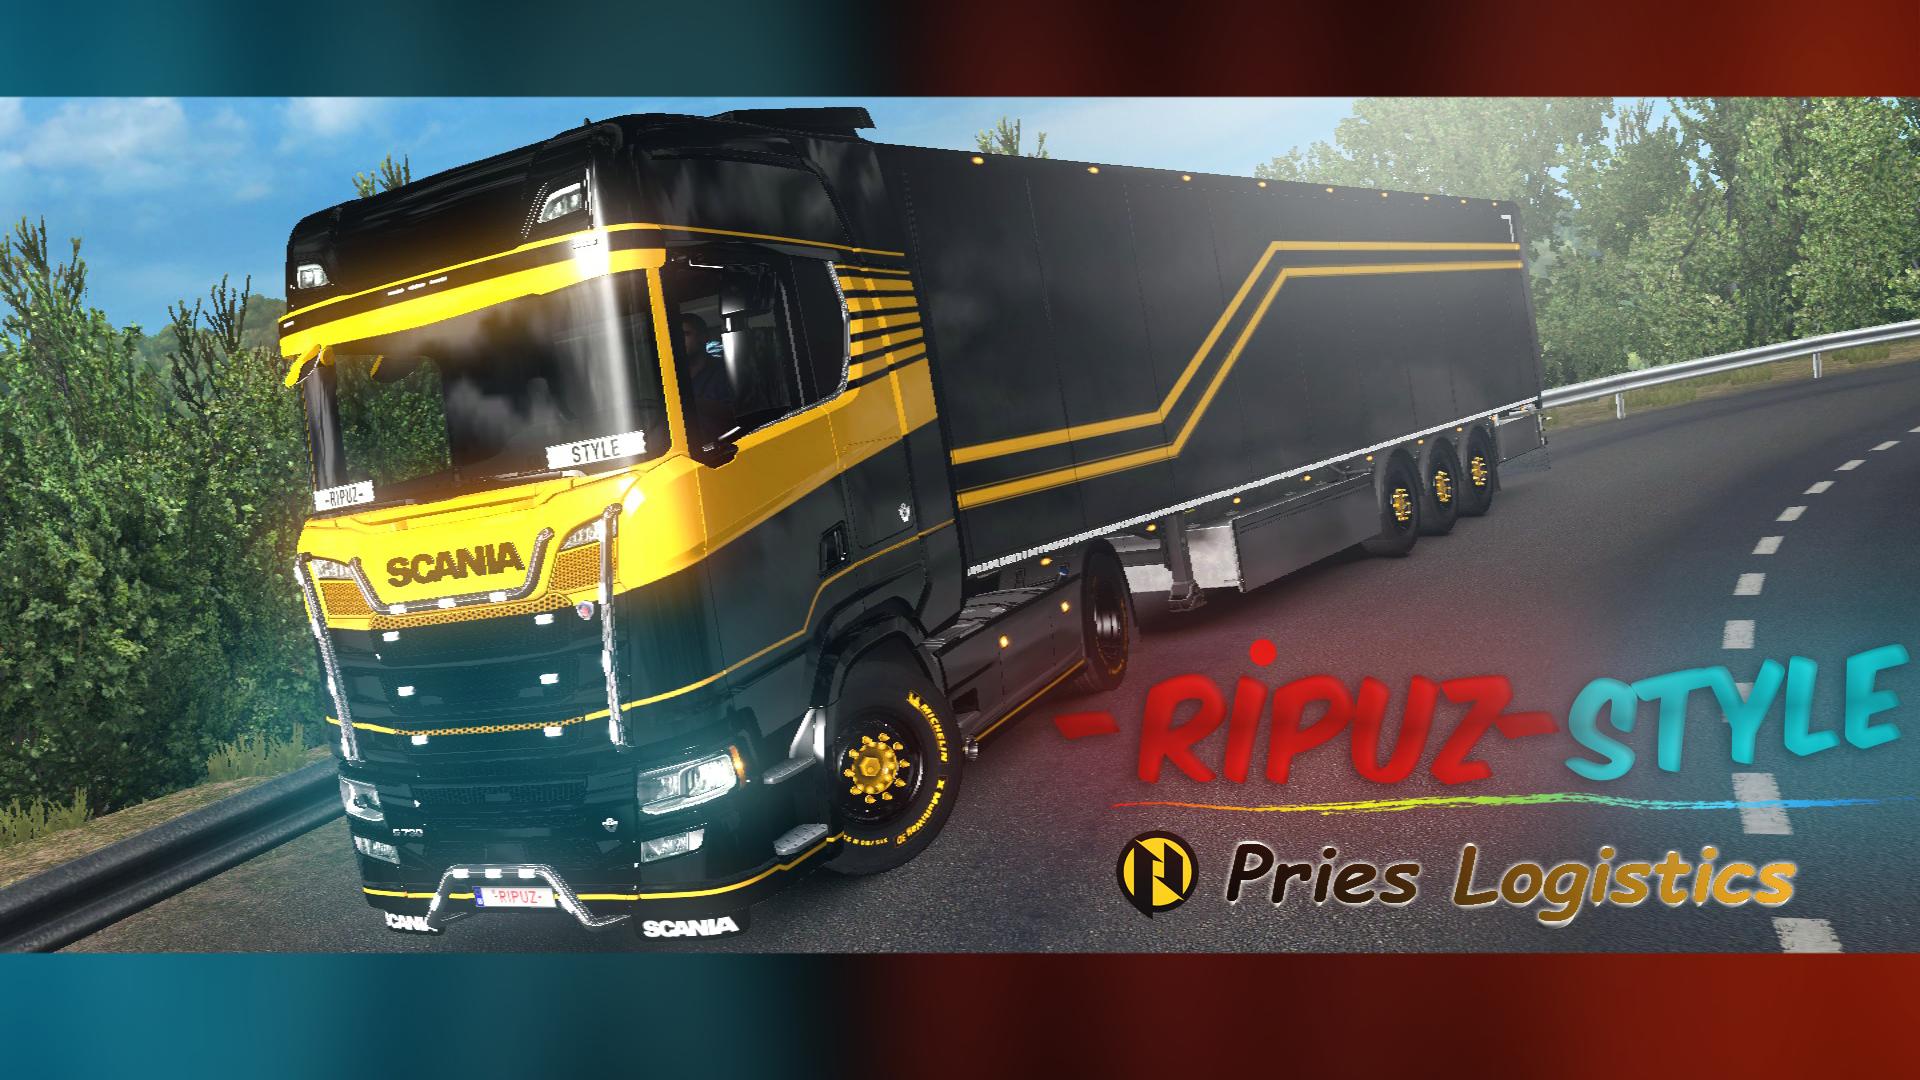 Ripuz-style-pries-logistics.png